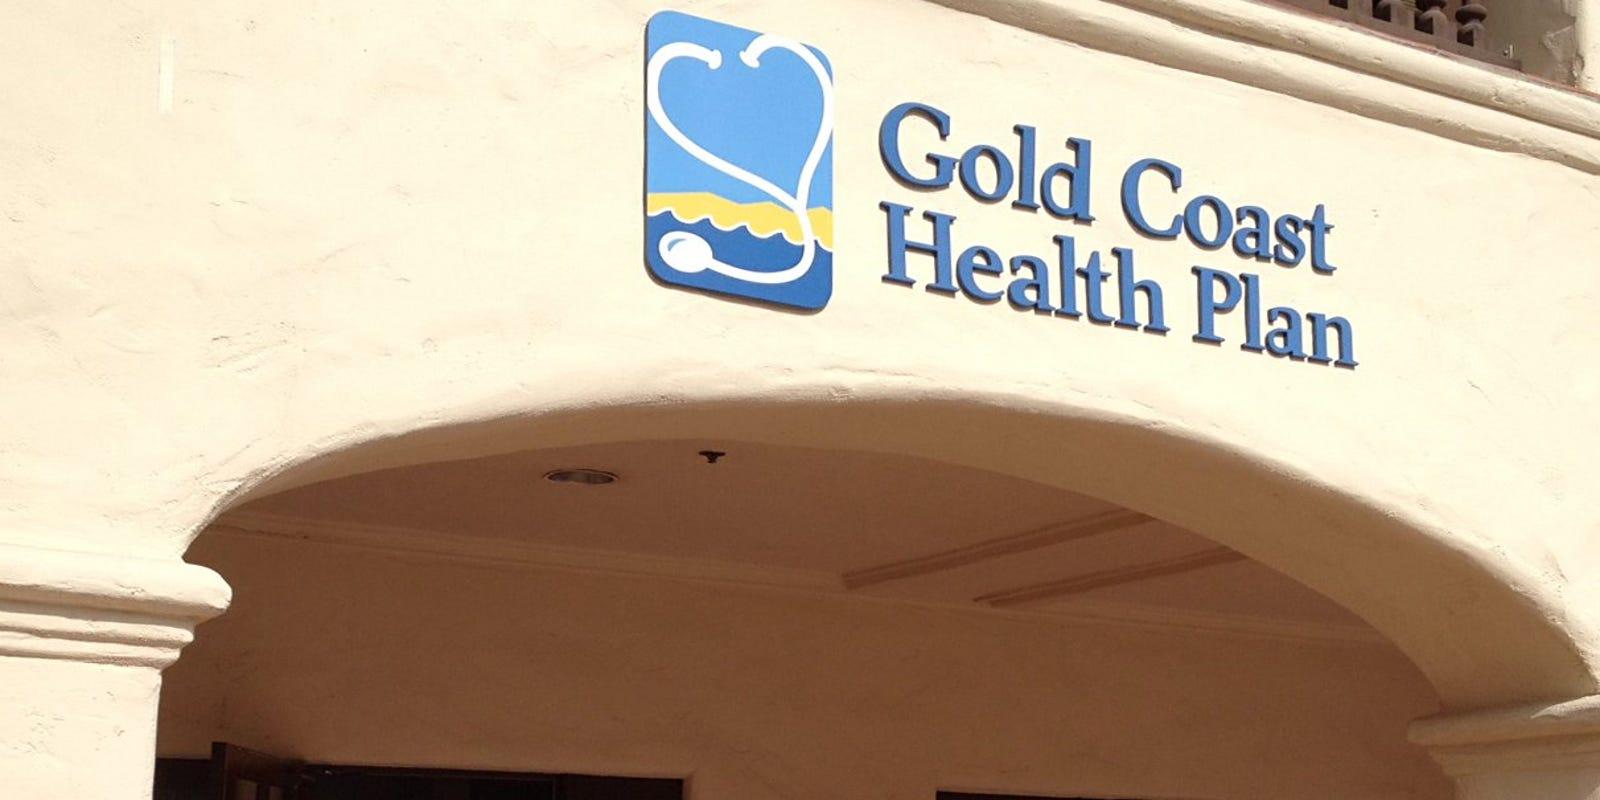 Gold Coast Health Plan projects $39 million loss, blames